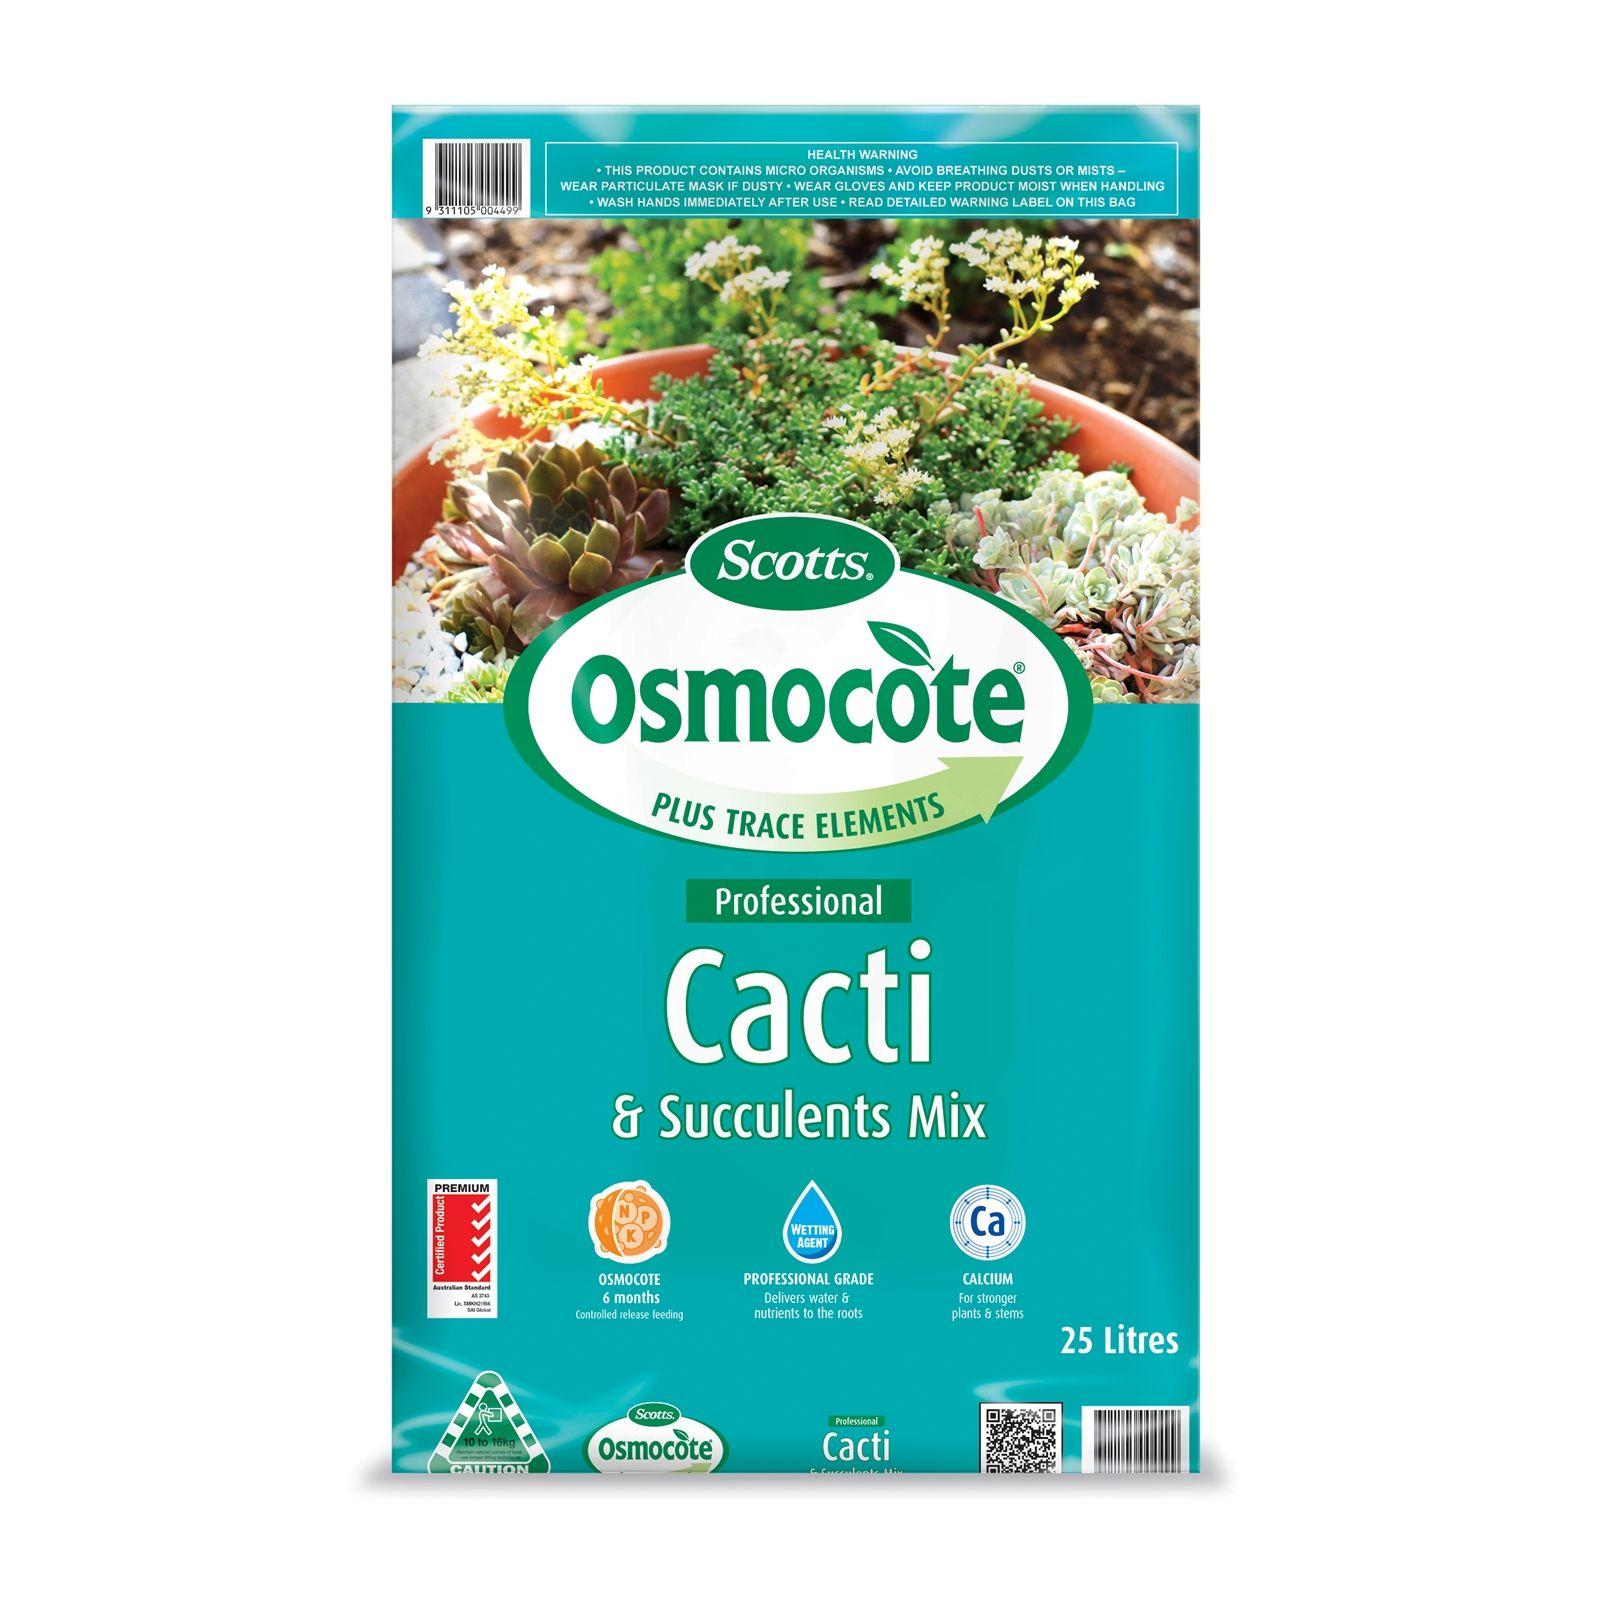 Osmocote 25L Professional Cacti And Succulents Potting Mix